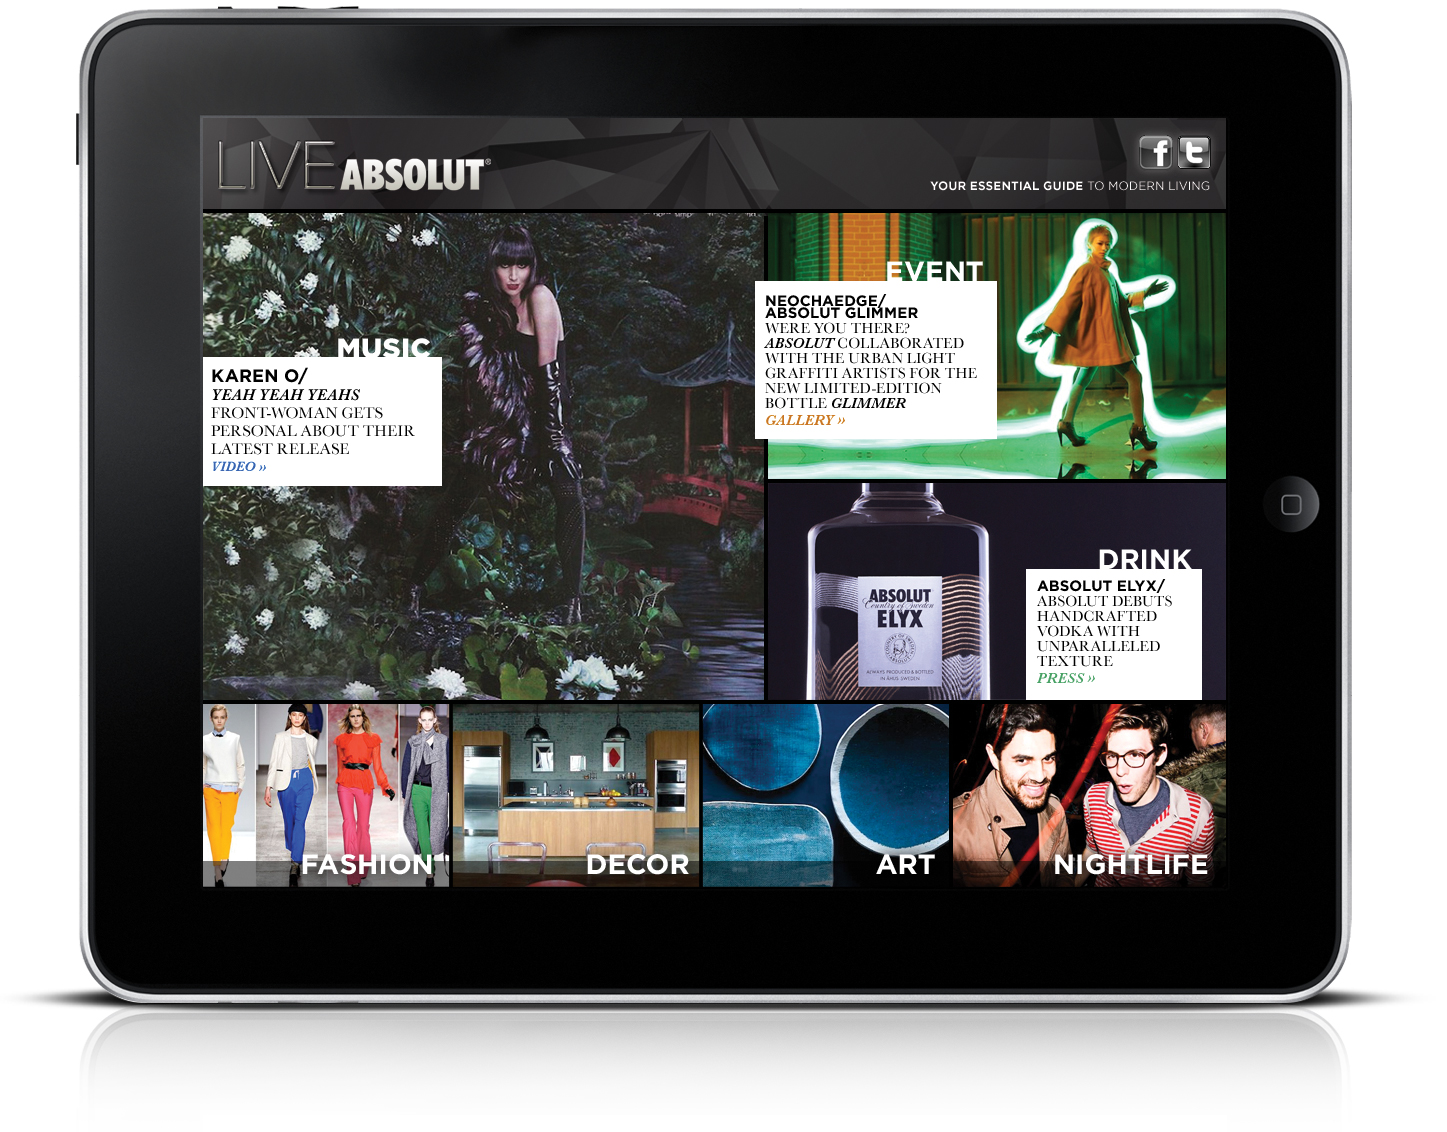 LIVEABSOLUT supplemental iPad content